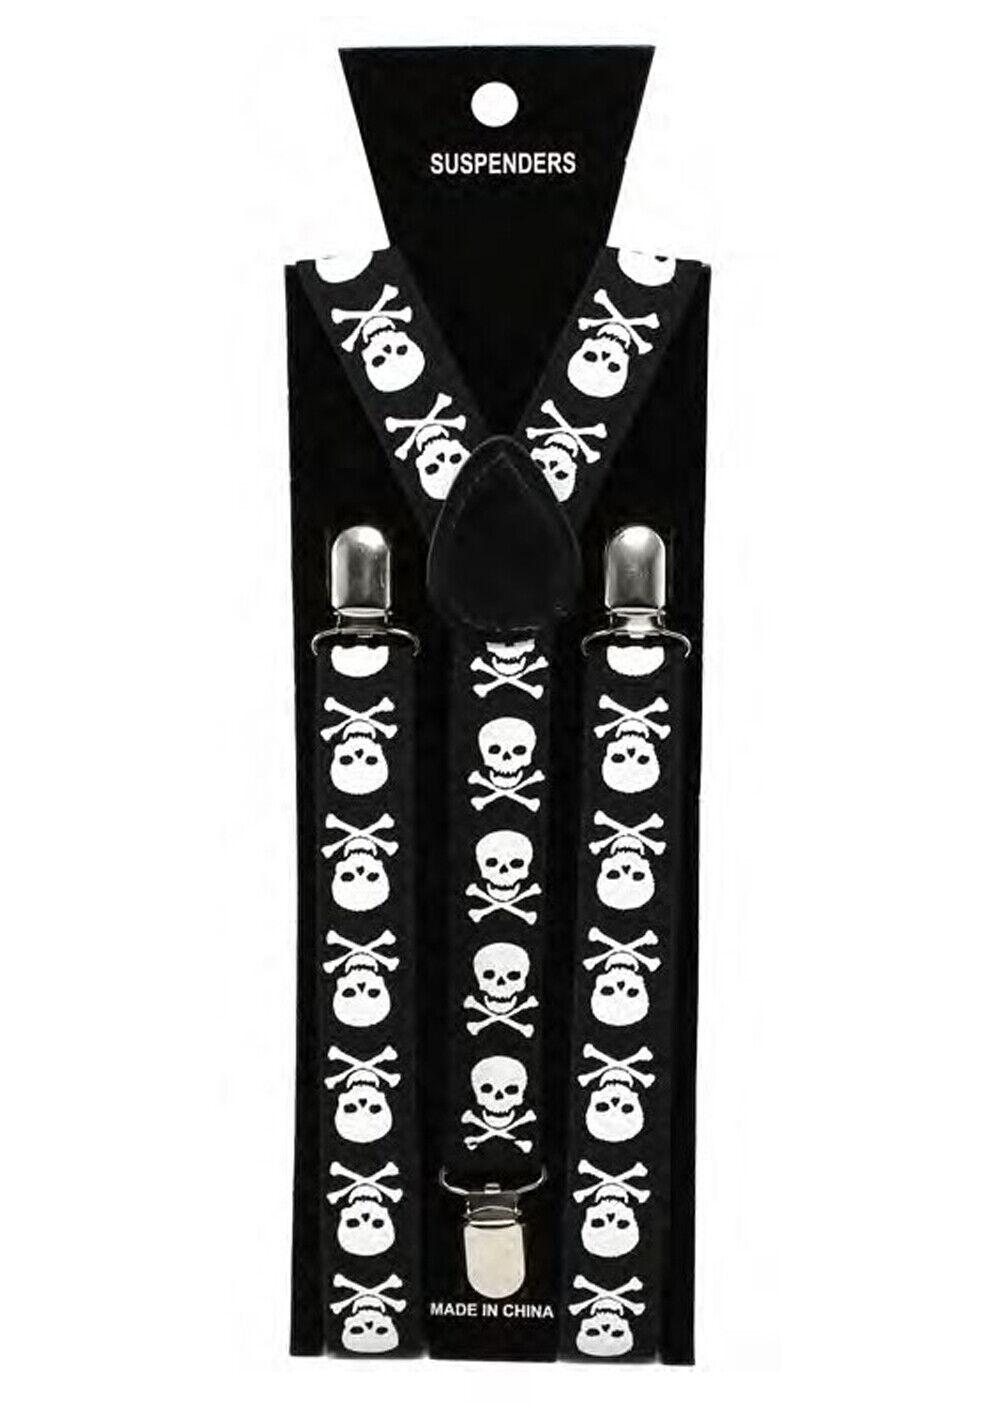 HALLOWEEN FANCY DRESS ACCESSORY Devil Witch Spooky Hanging Party Decor Lot UK